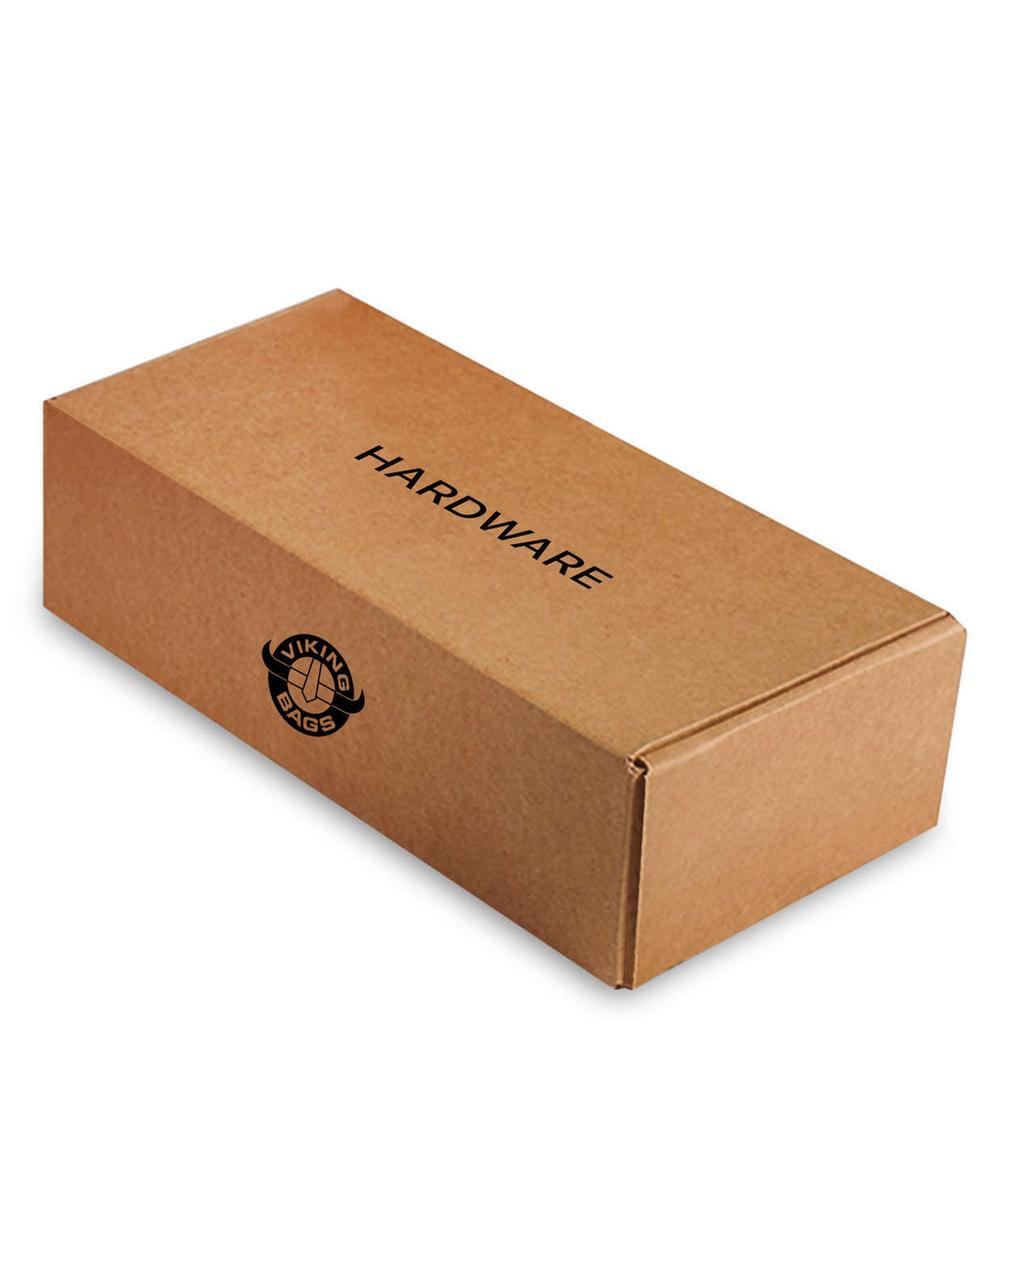 Honda 750 Shadow Aero Trianon Plain Leather Motorcycle Saddlebags hardware Box